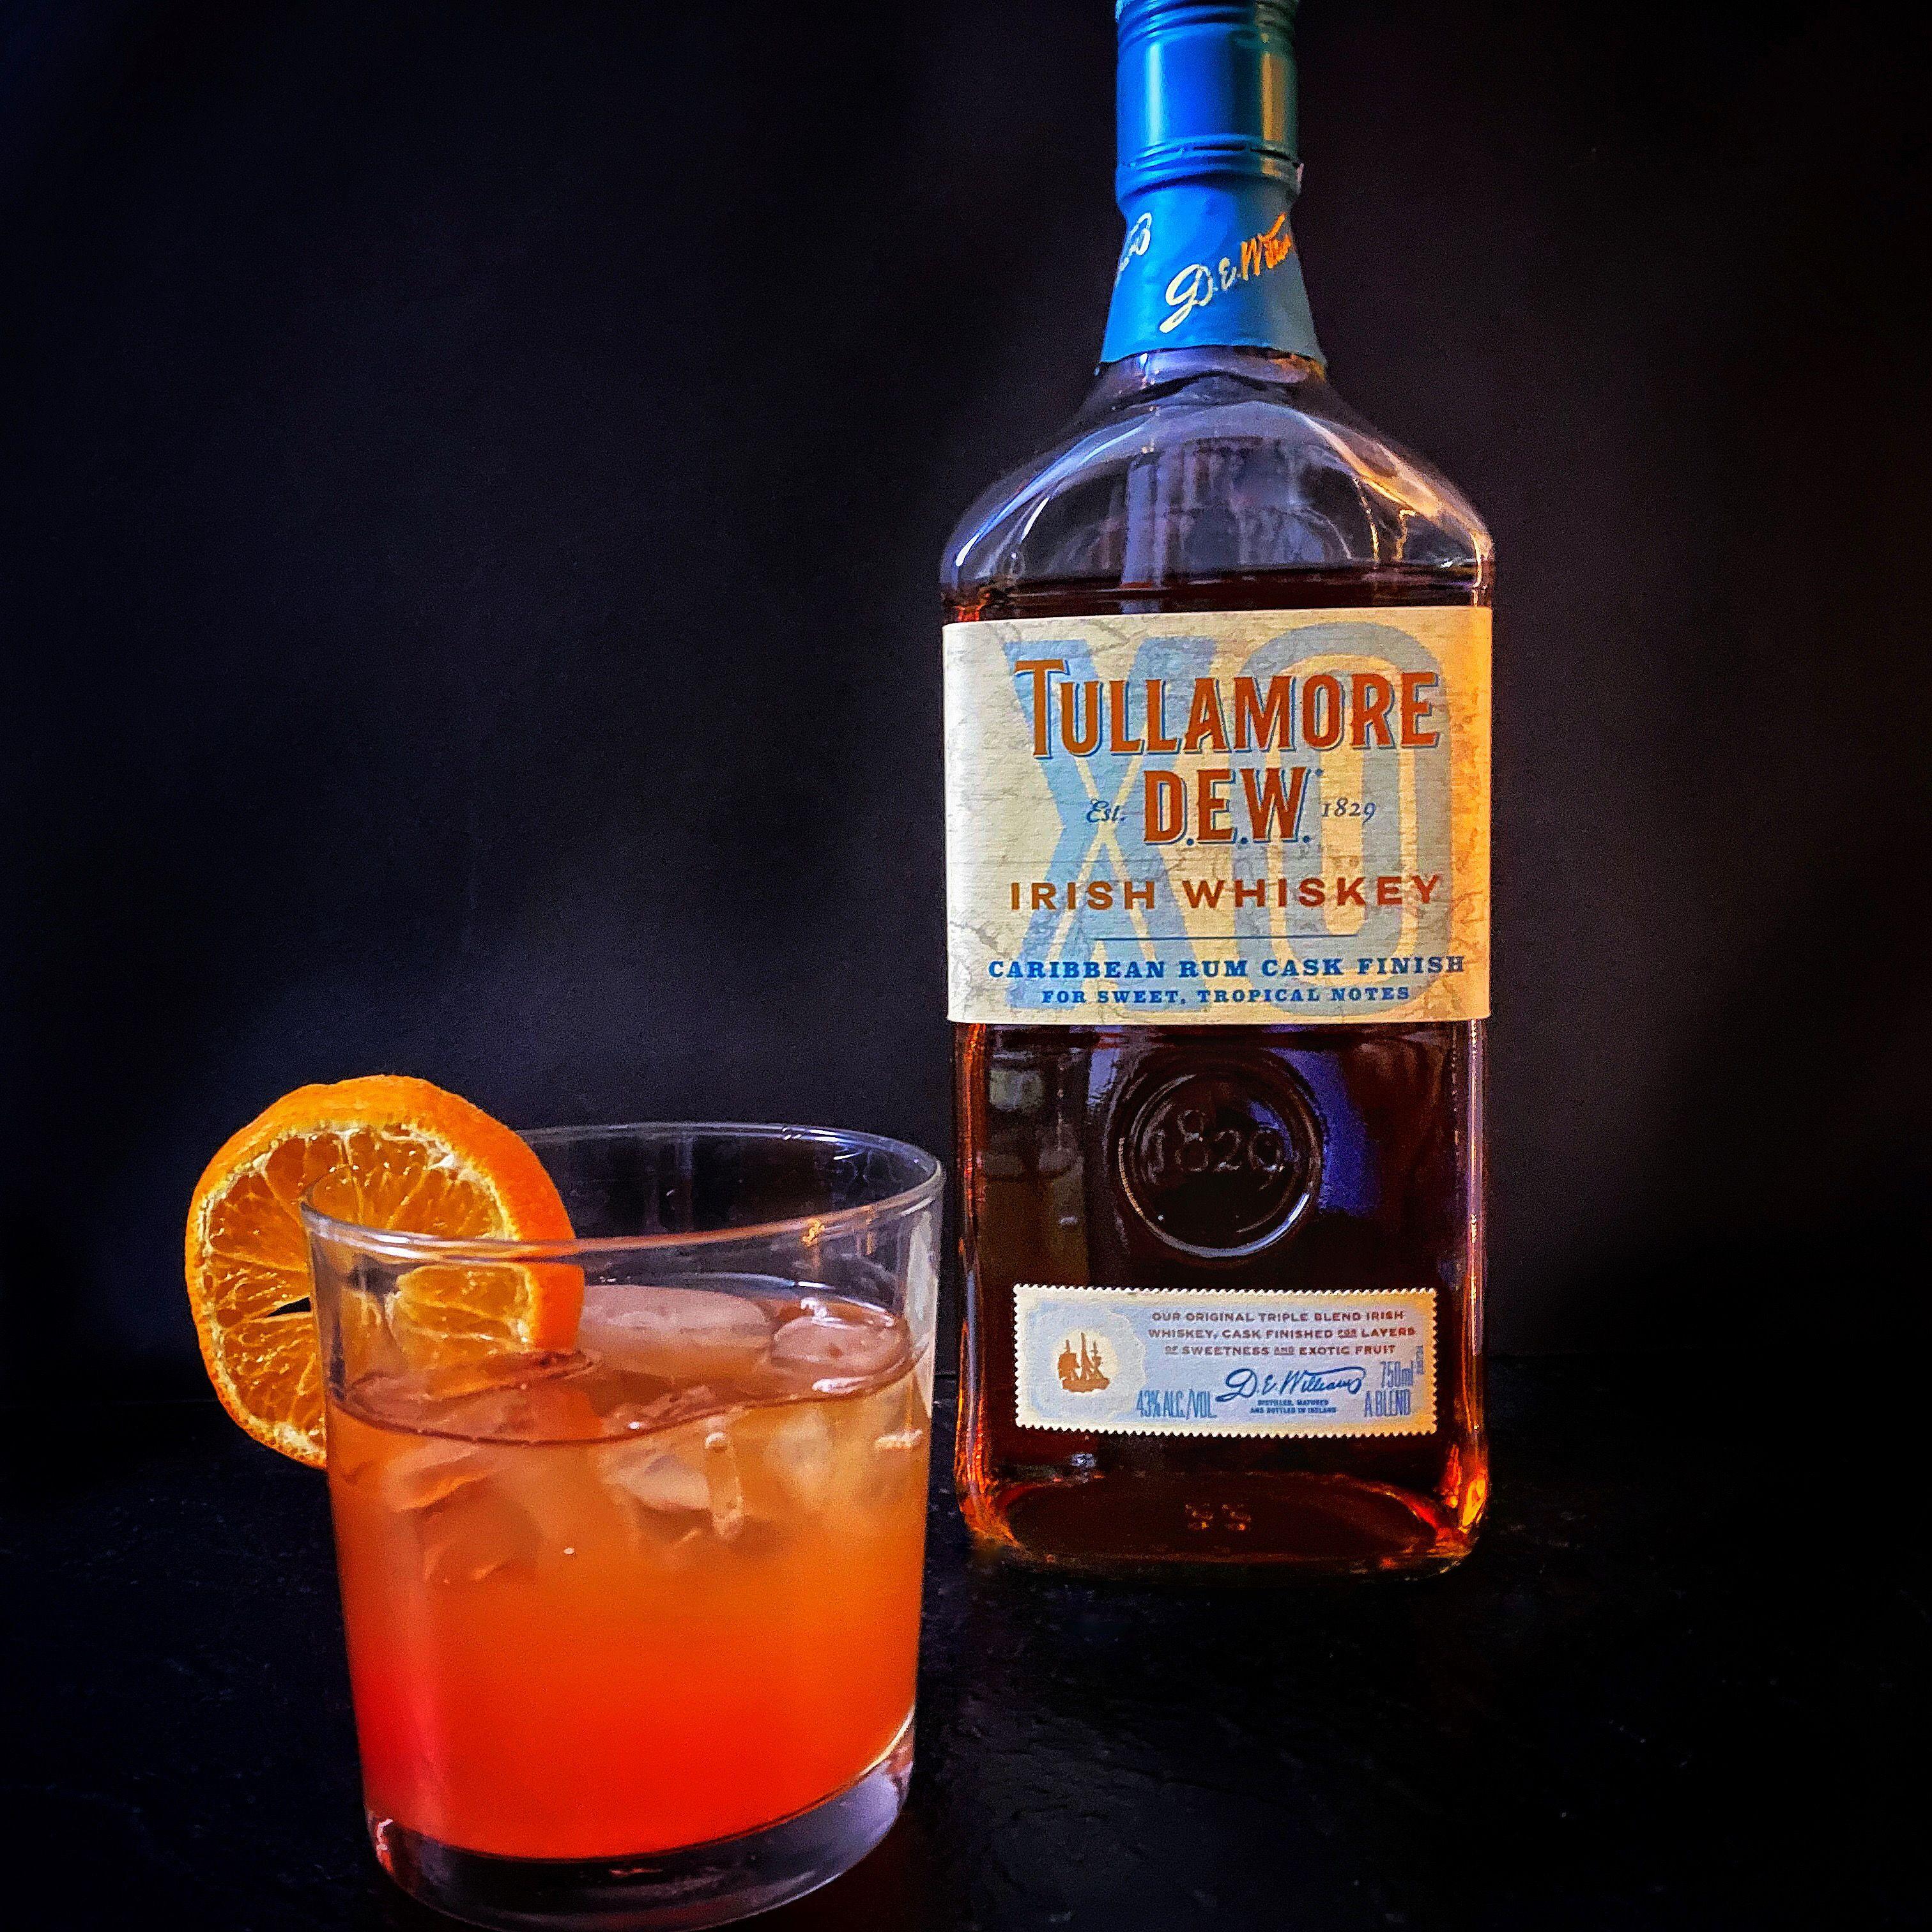 Tullamore Dew Caribbean Rum Cask in 2020 Caribbean rum